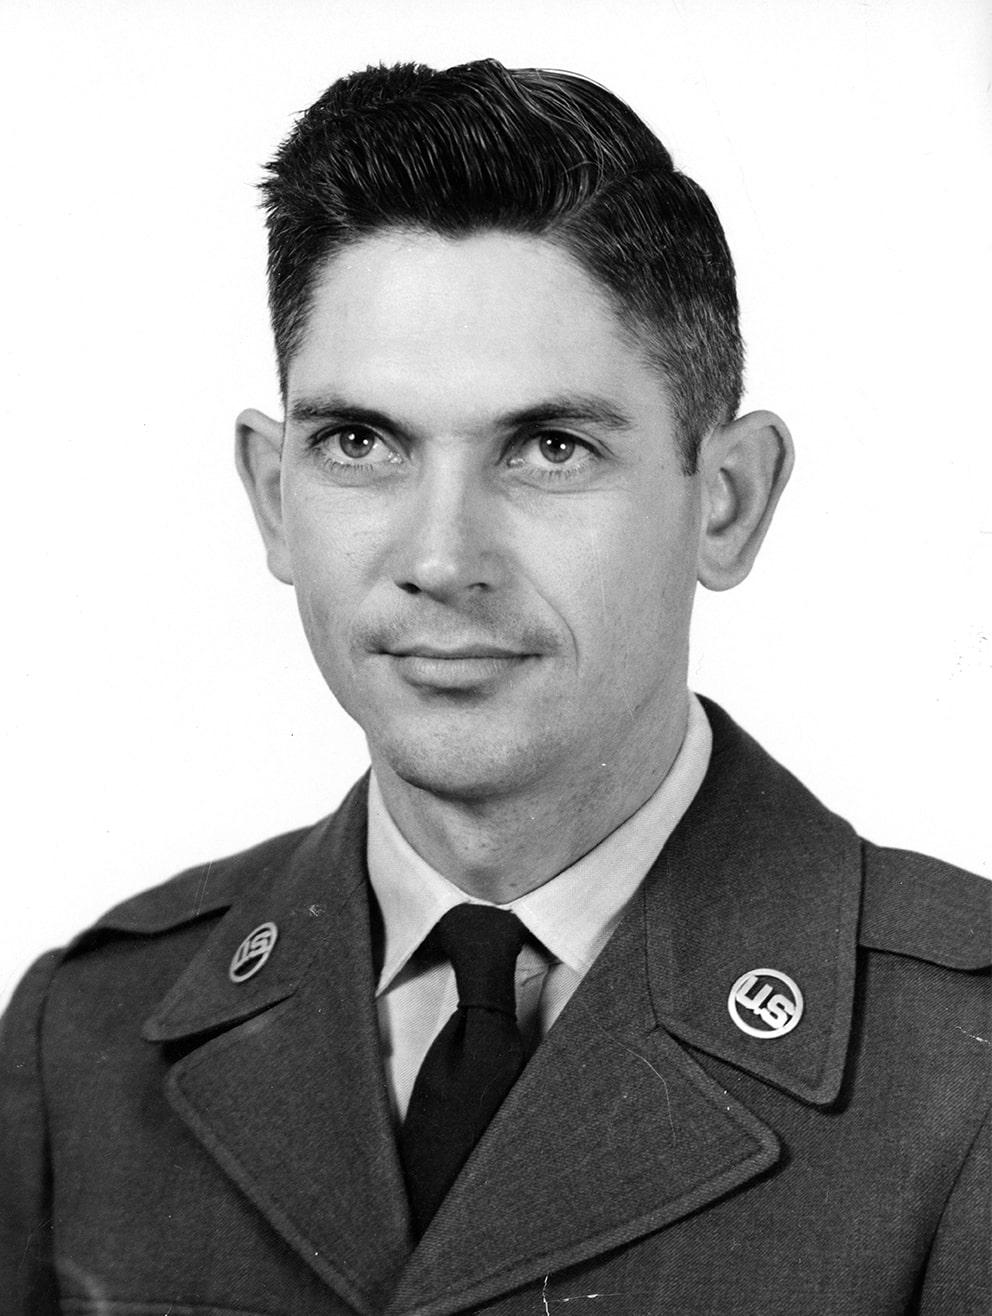 Bobby Vance